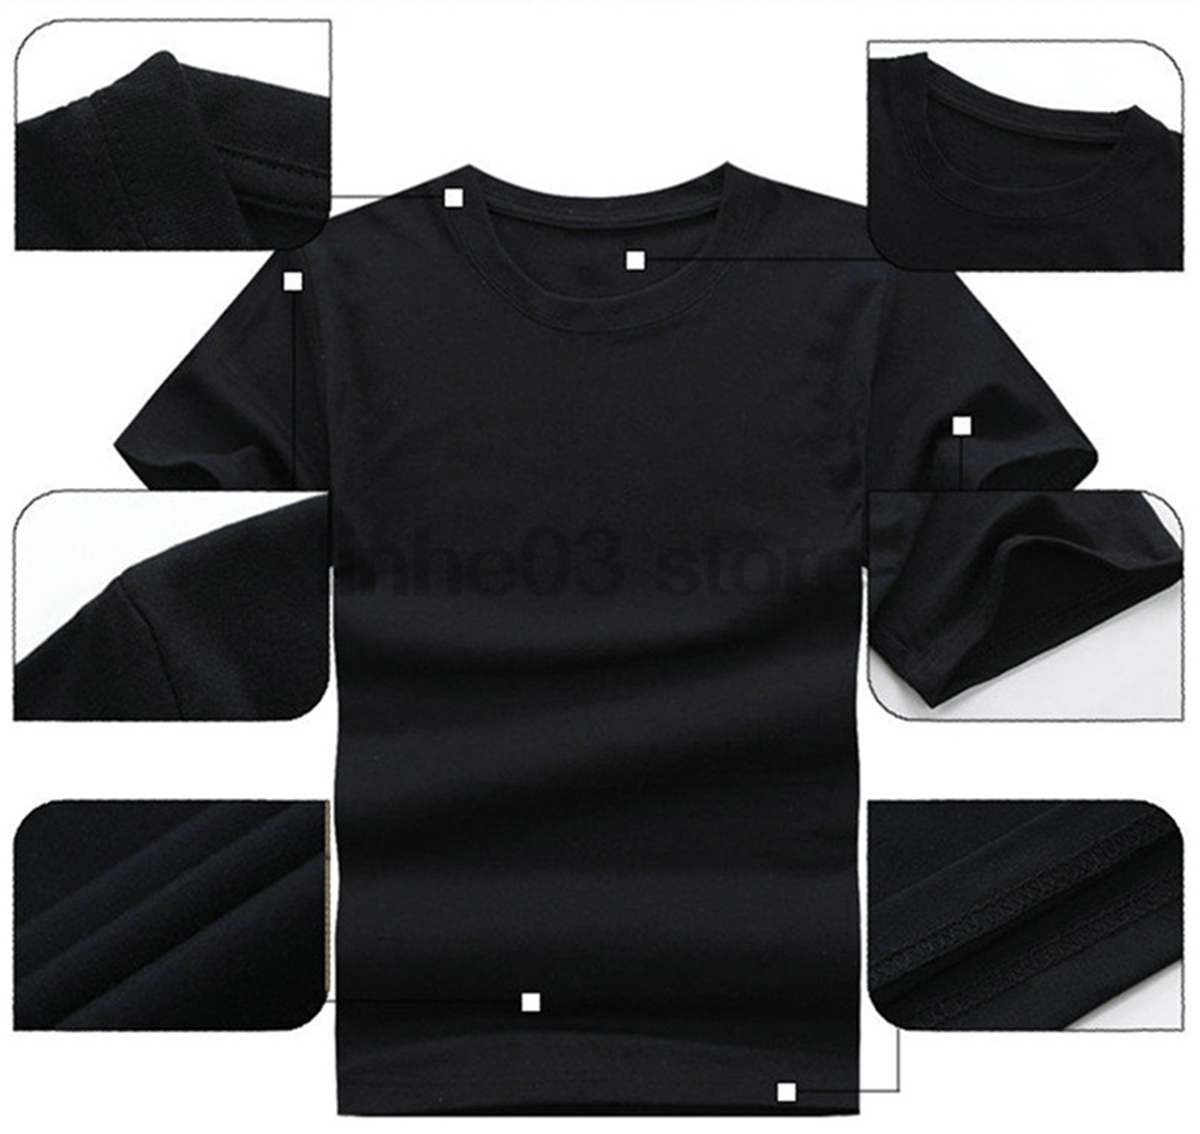 GILDAN The Frying Pan Solo Chicken PUBG Gaming Tshirt Hot Womens T-shirt Mothers Day Ms. T-shirt